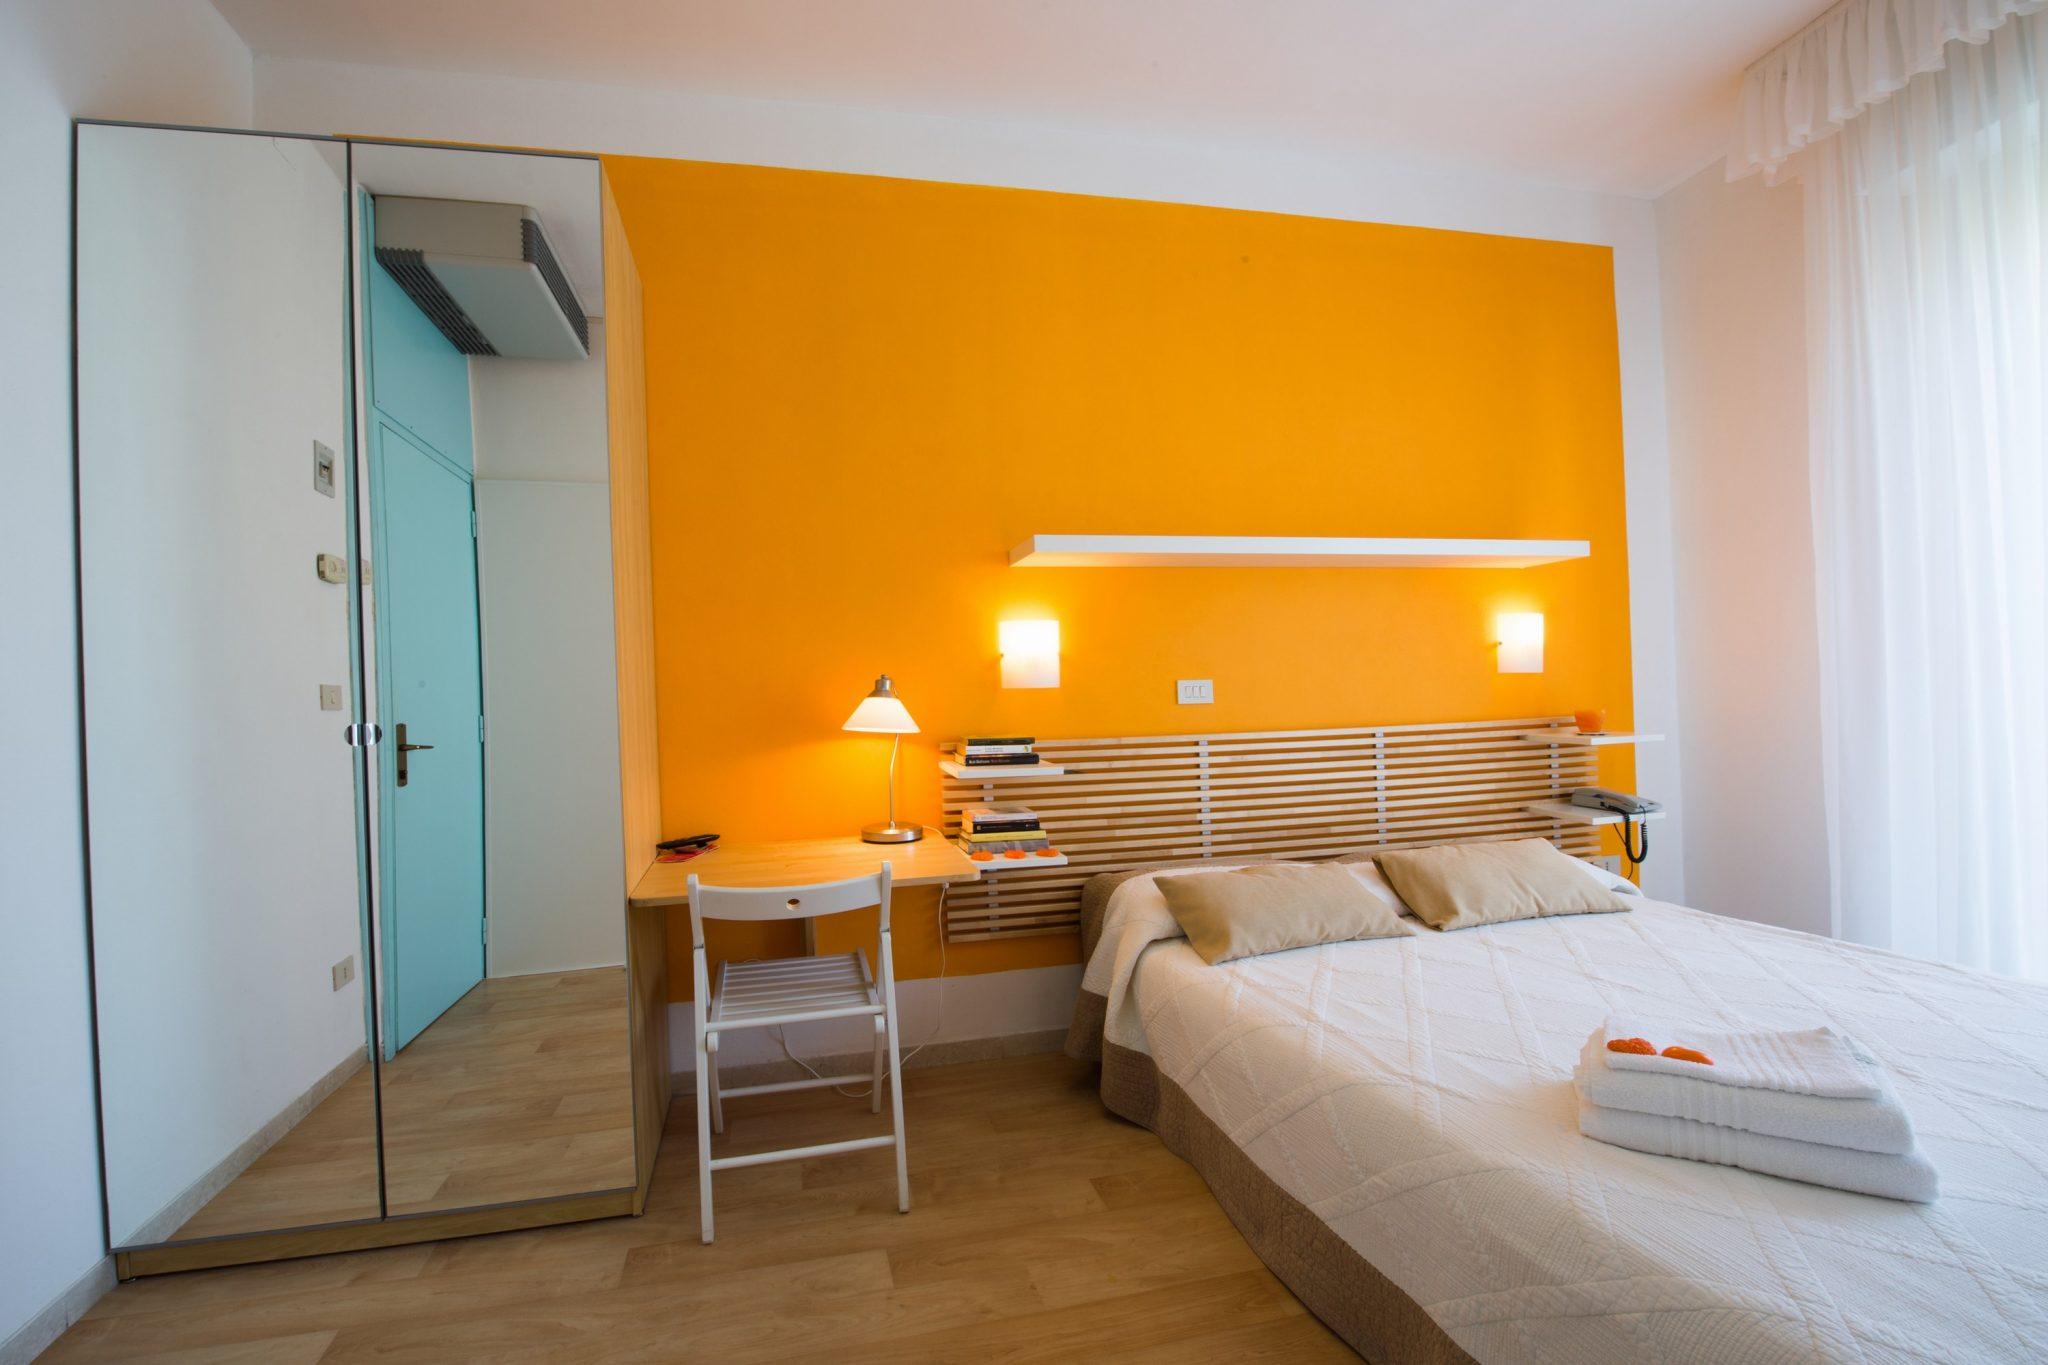 http://www.hotelvenezuela.it/wp-content/uploads/2016/11/mini-HVE_0006.jpg